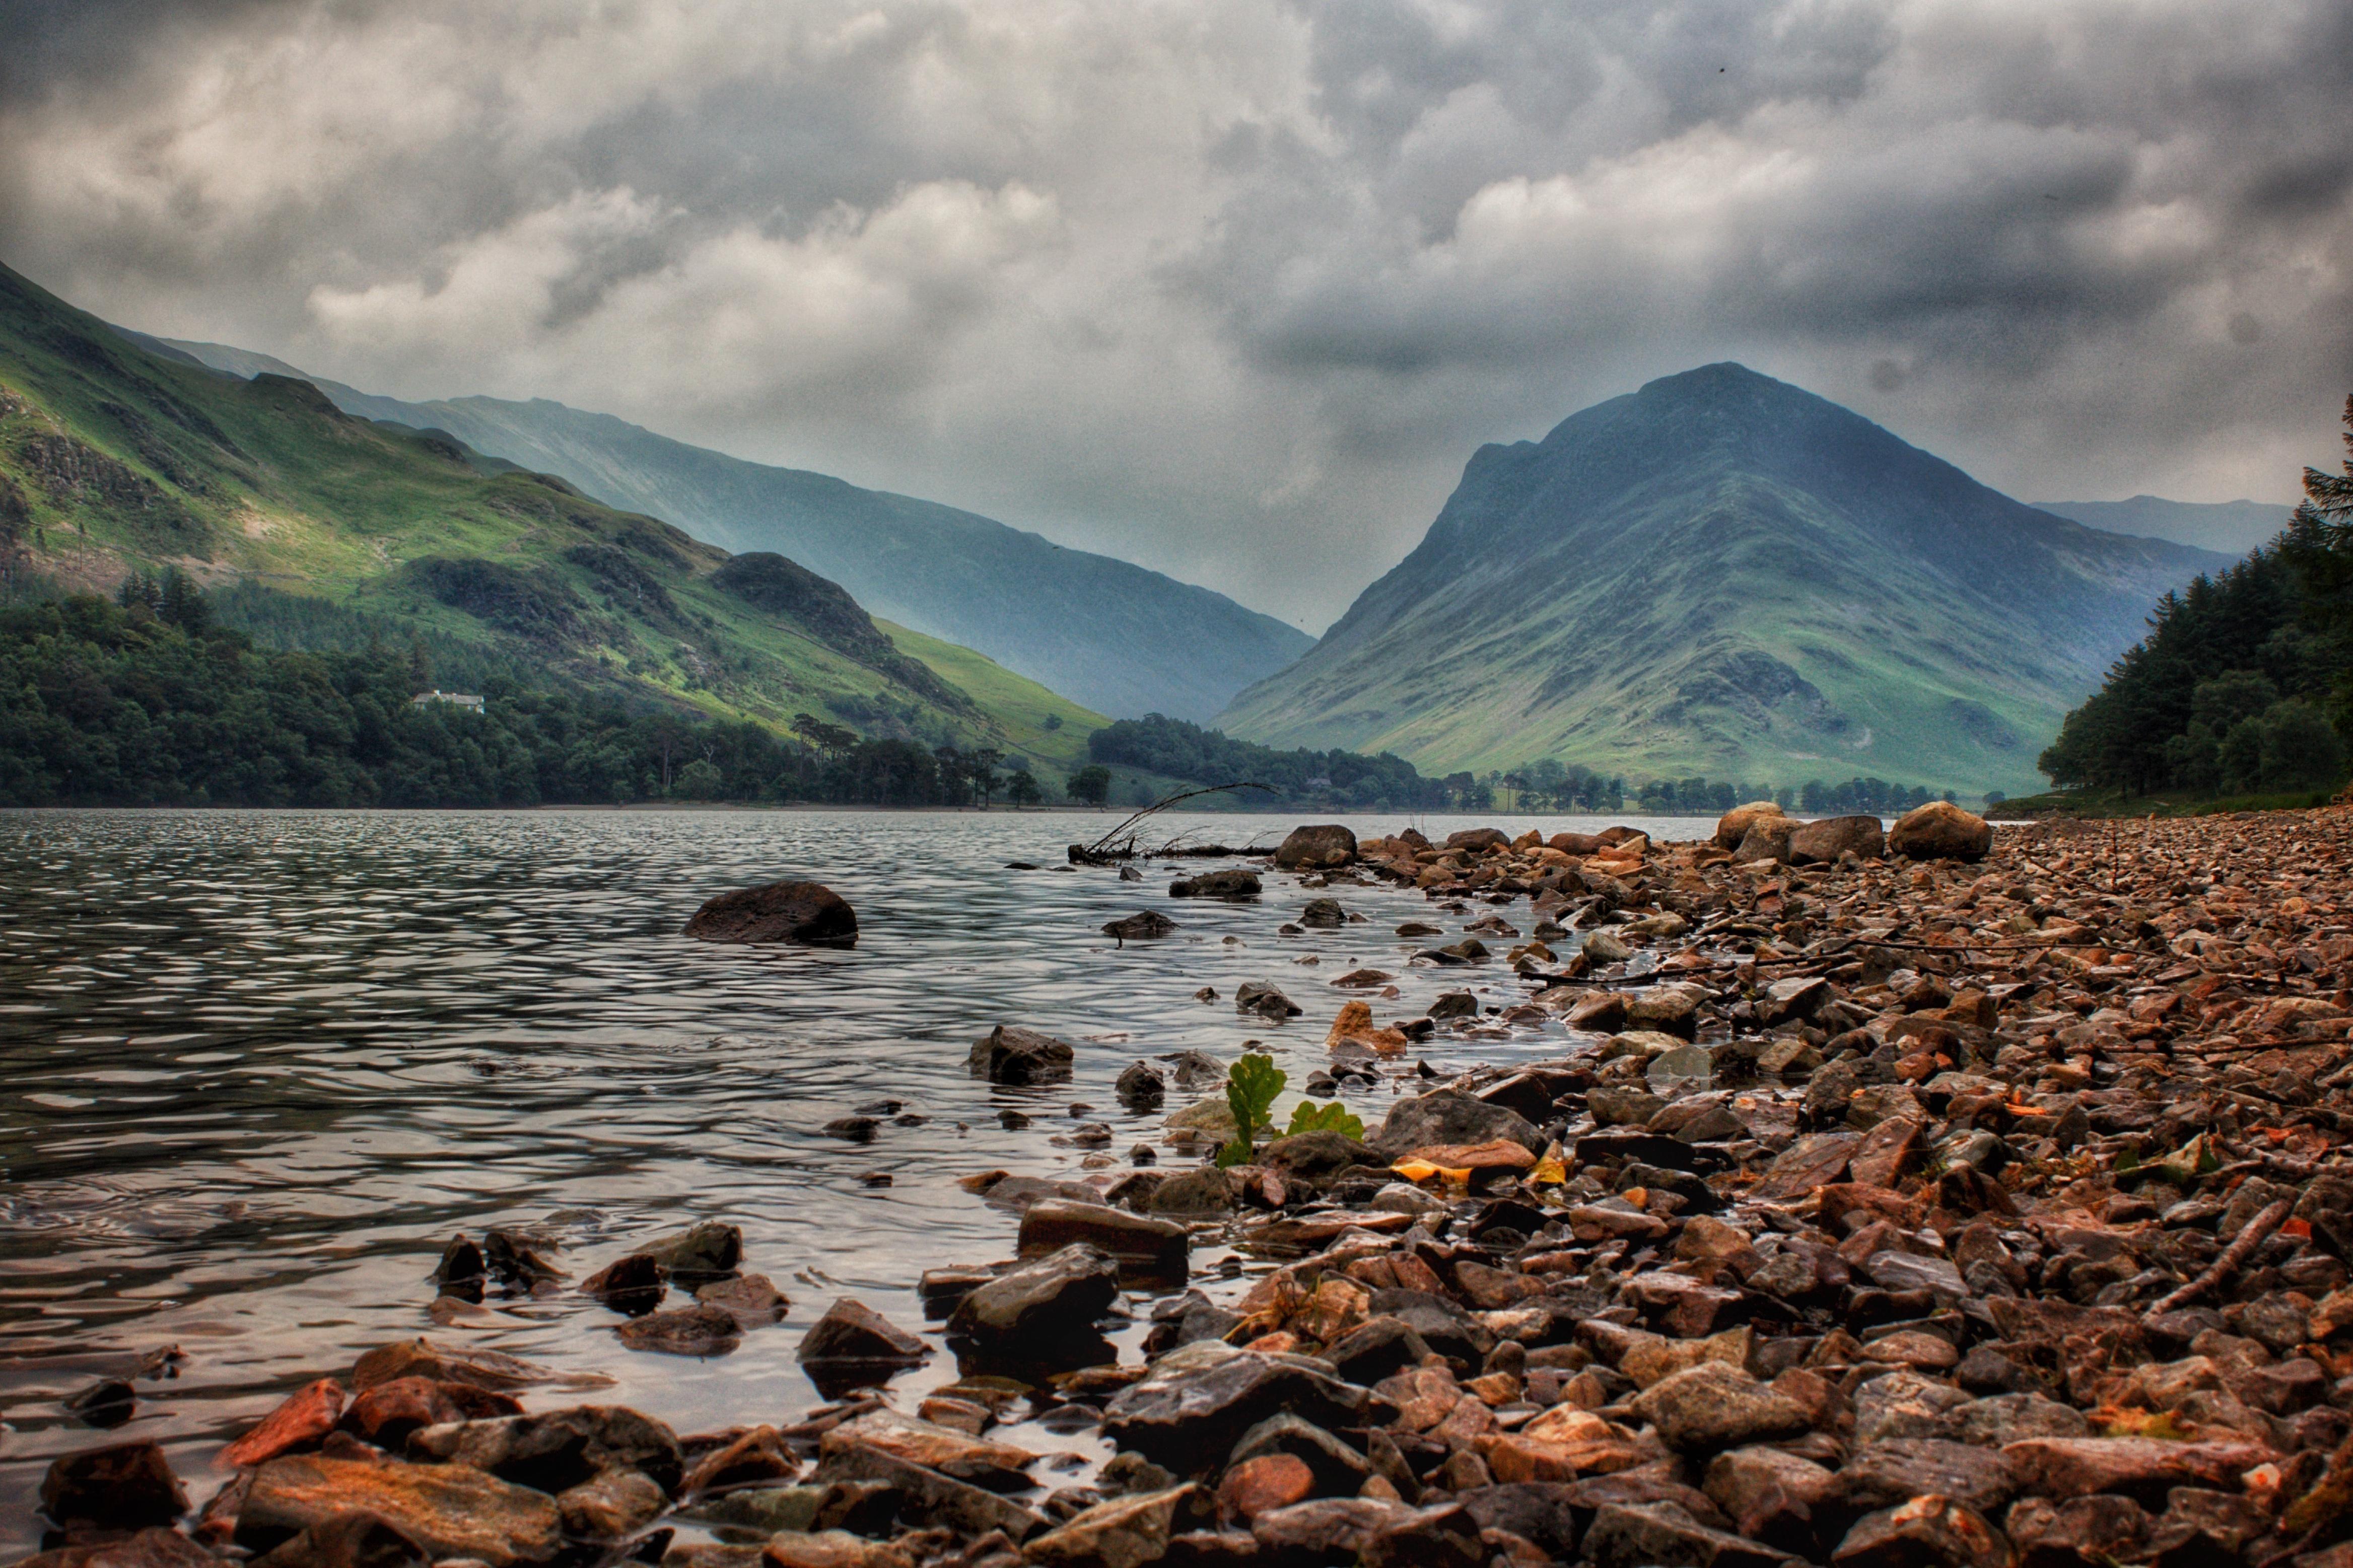 Buttermere Lake District Uk Oc 4672 3114 Lake District Lake Travel Inspiration